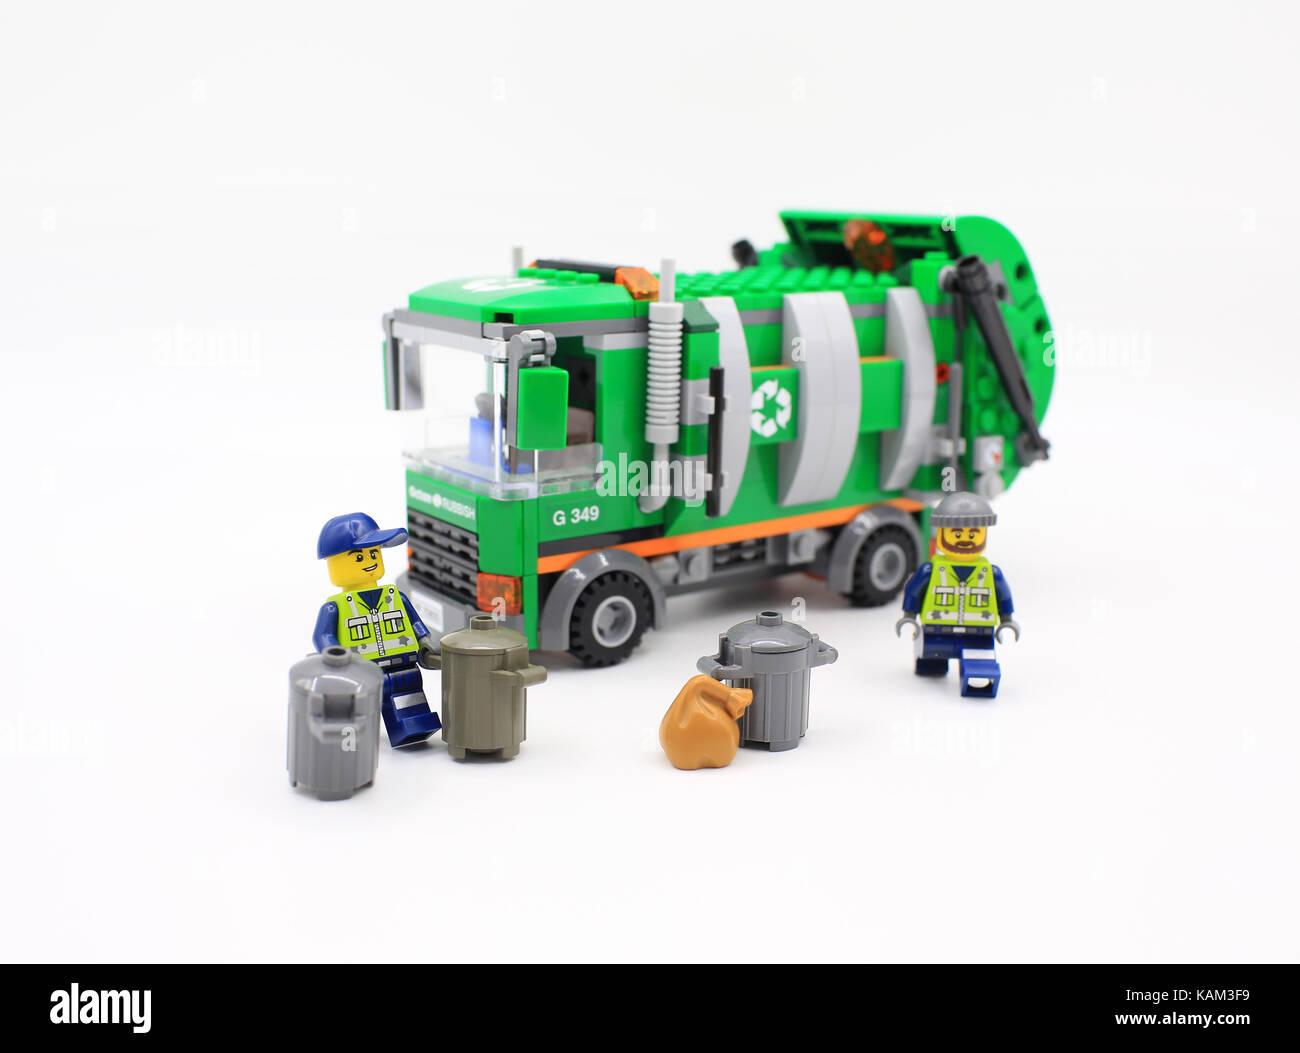 lego city cleaner - Stock Image